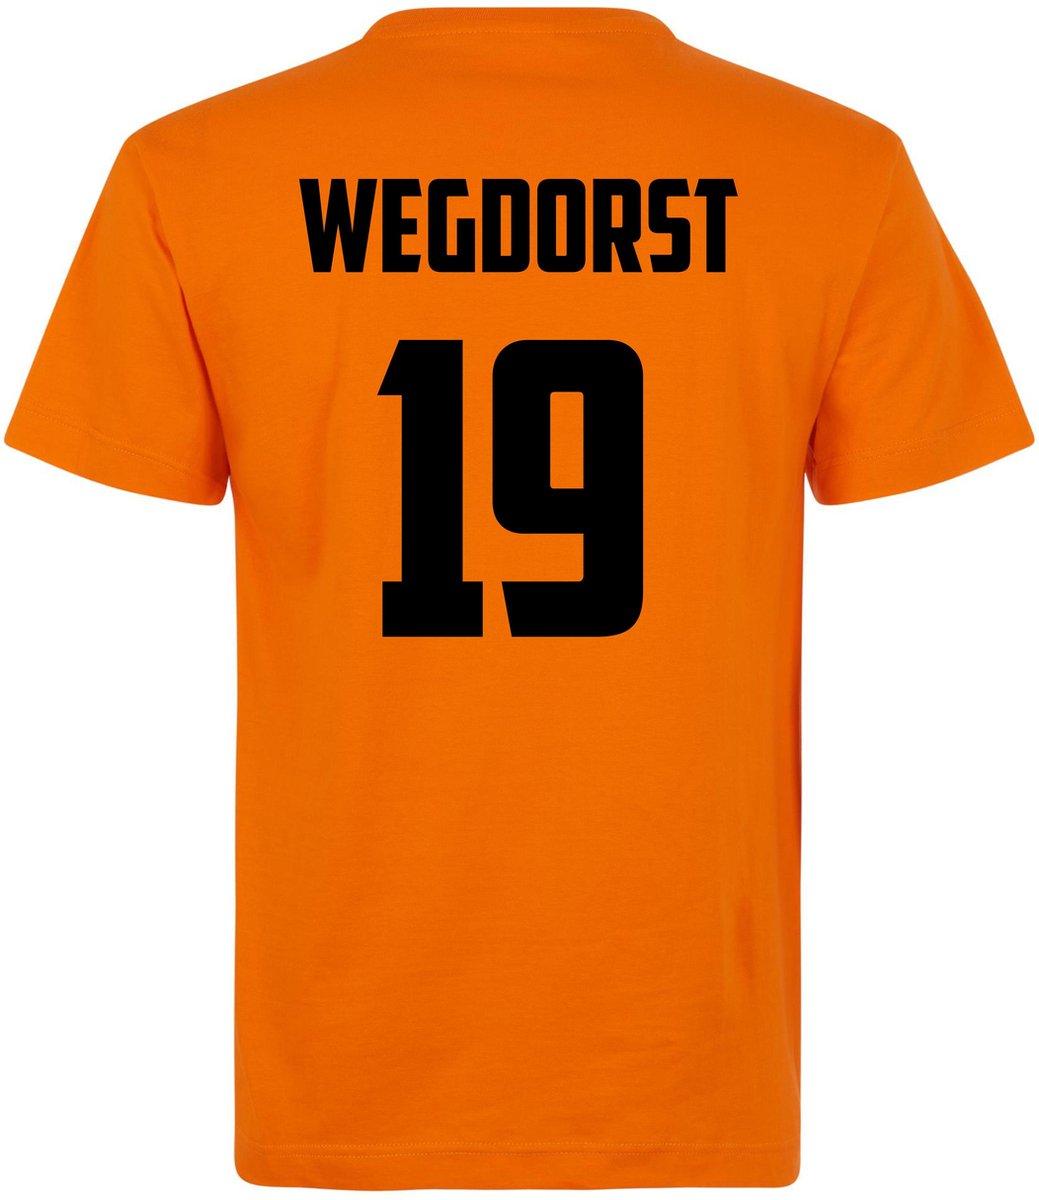 T-shirt oranje Holland WEGDORST 19 | EK Voetbal 2020 2021 | Nederlands elftal shirt | Nederland supporter | Holland souvenir ...